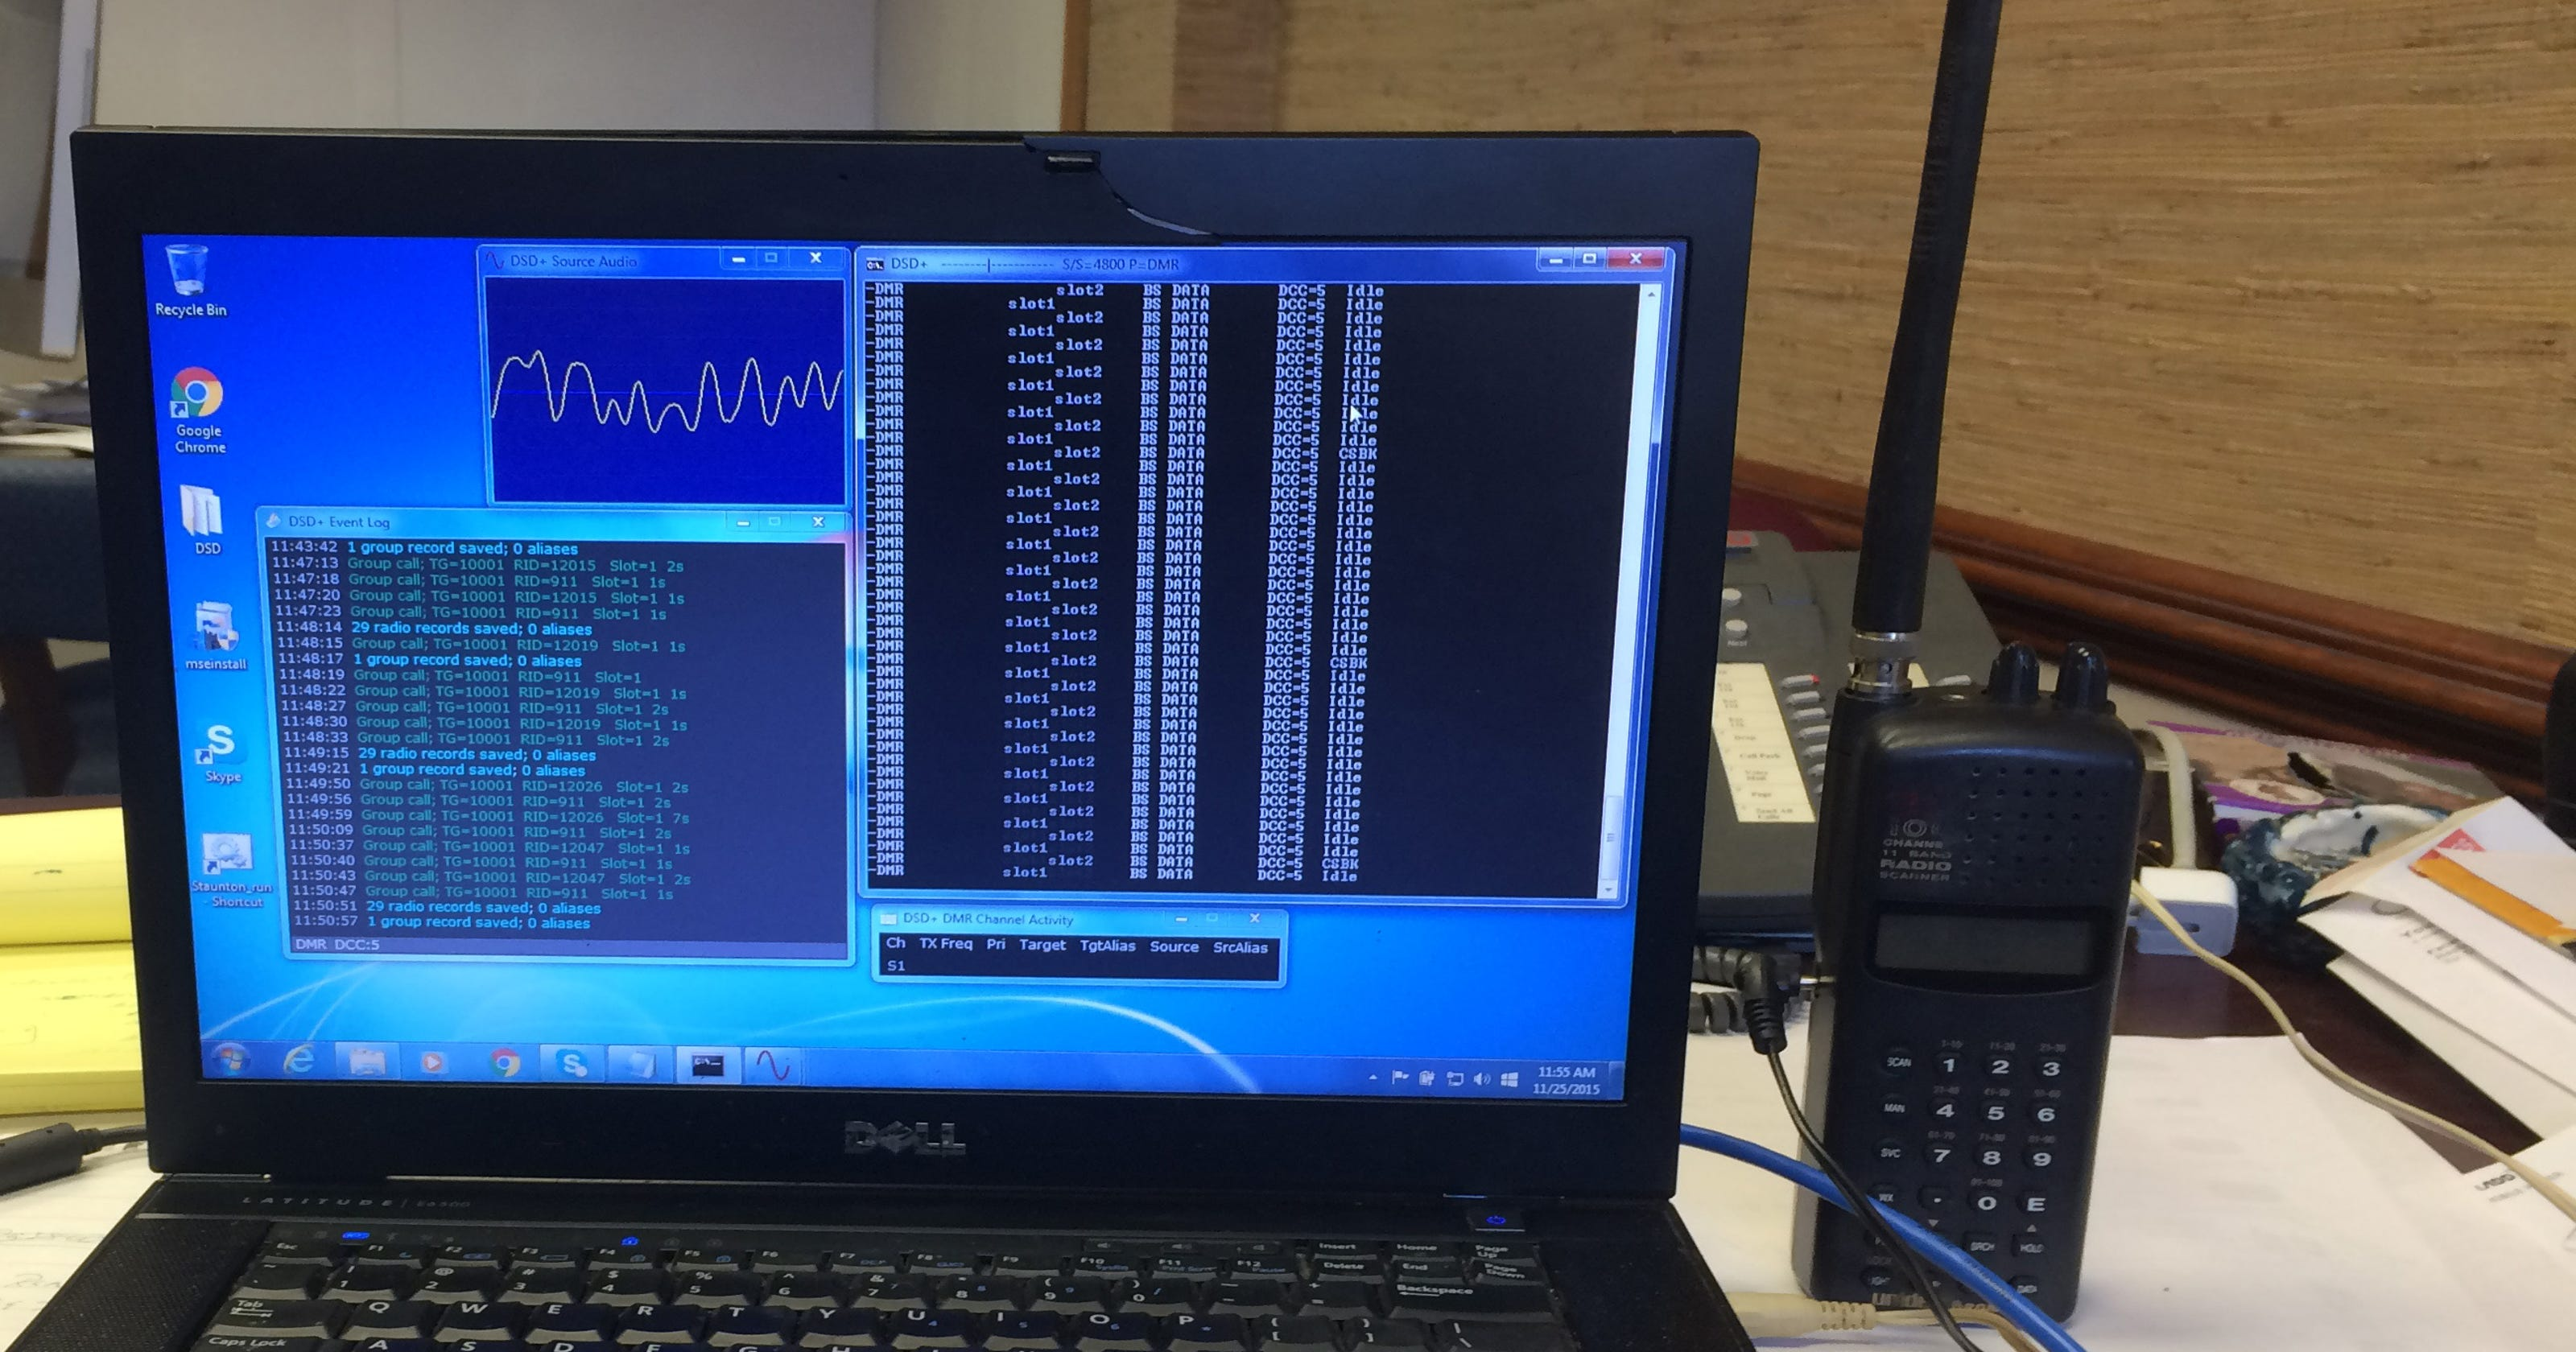 Cracking the Staunton police scanner code